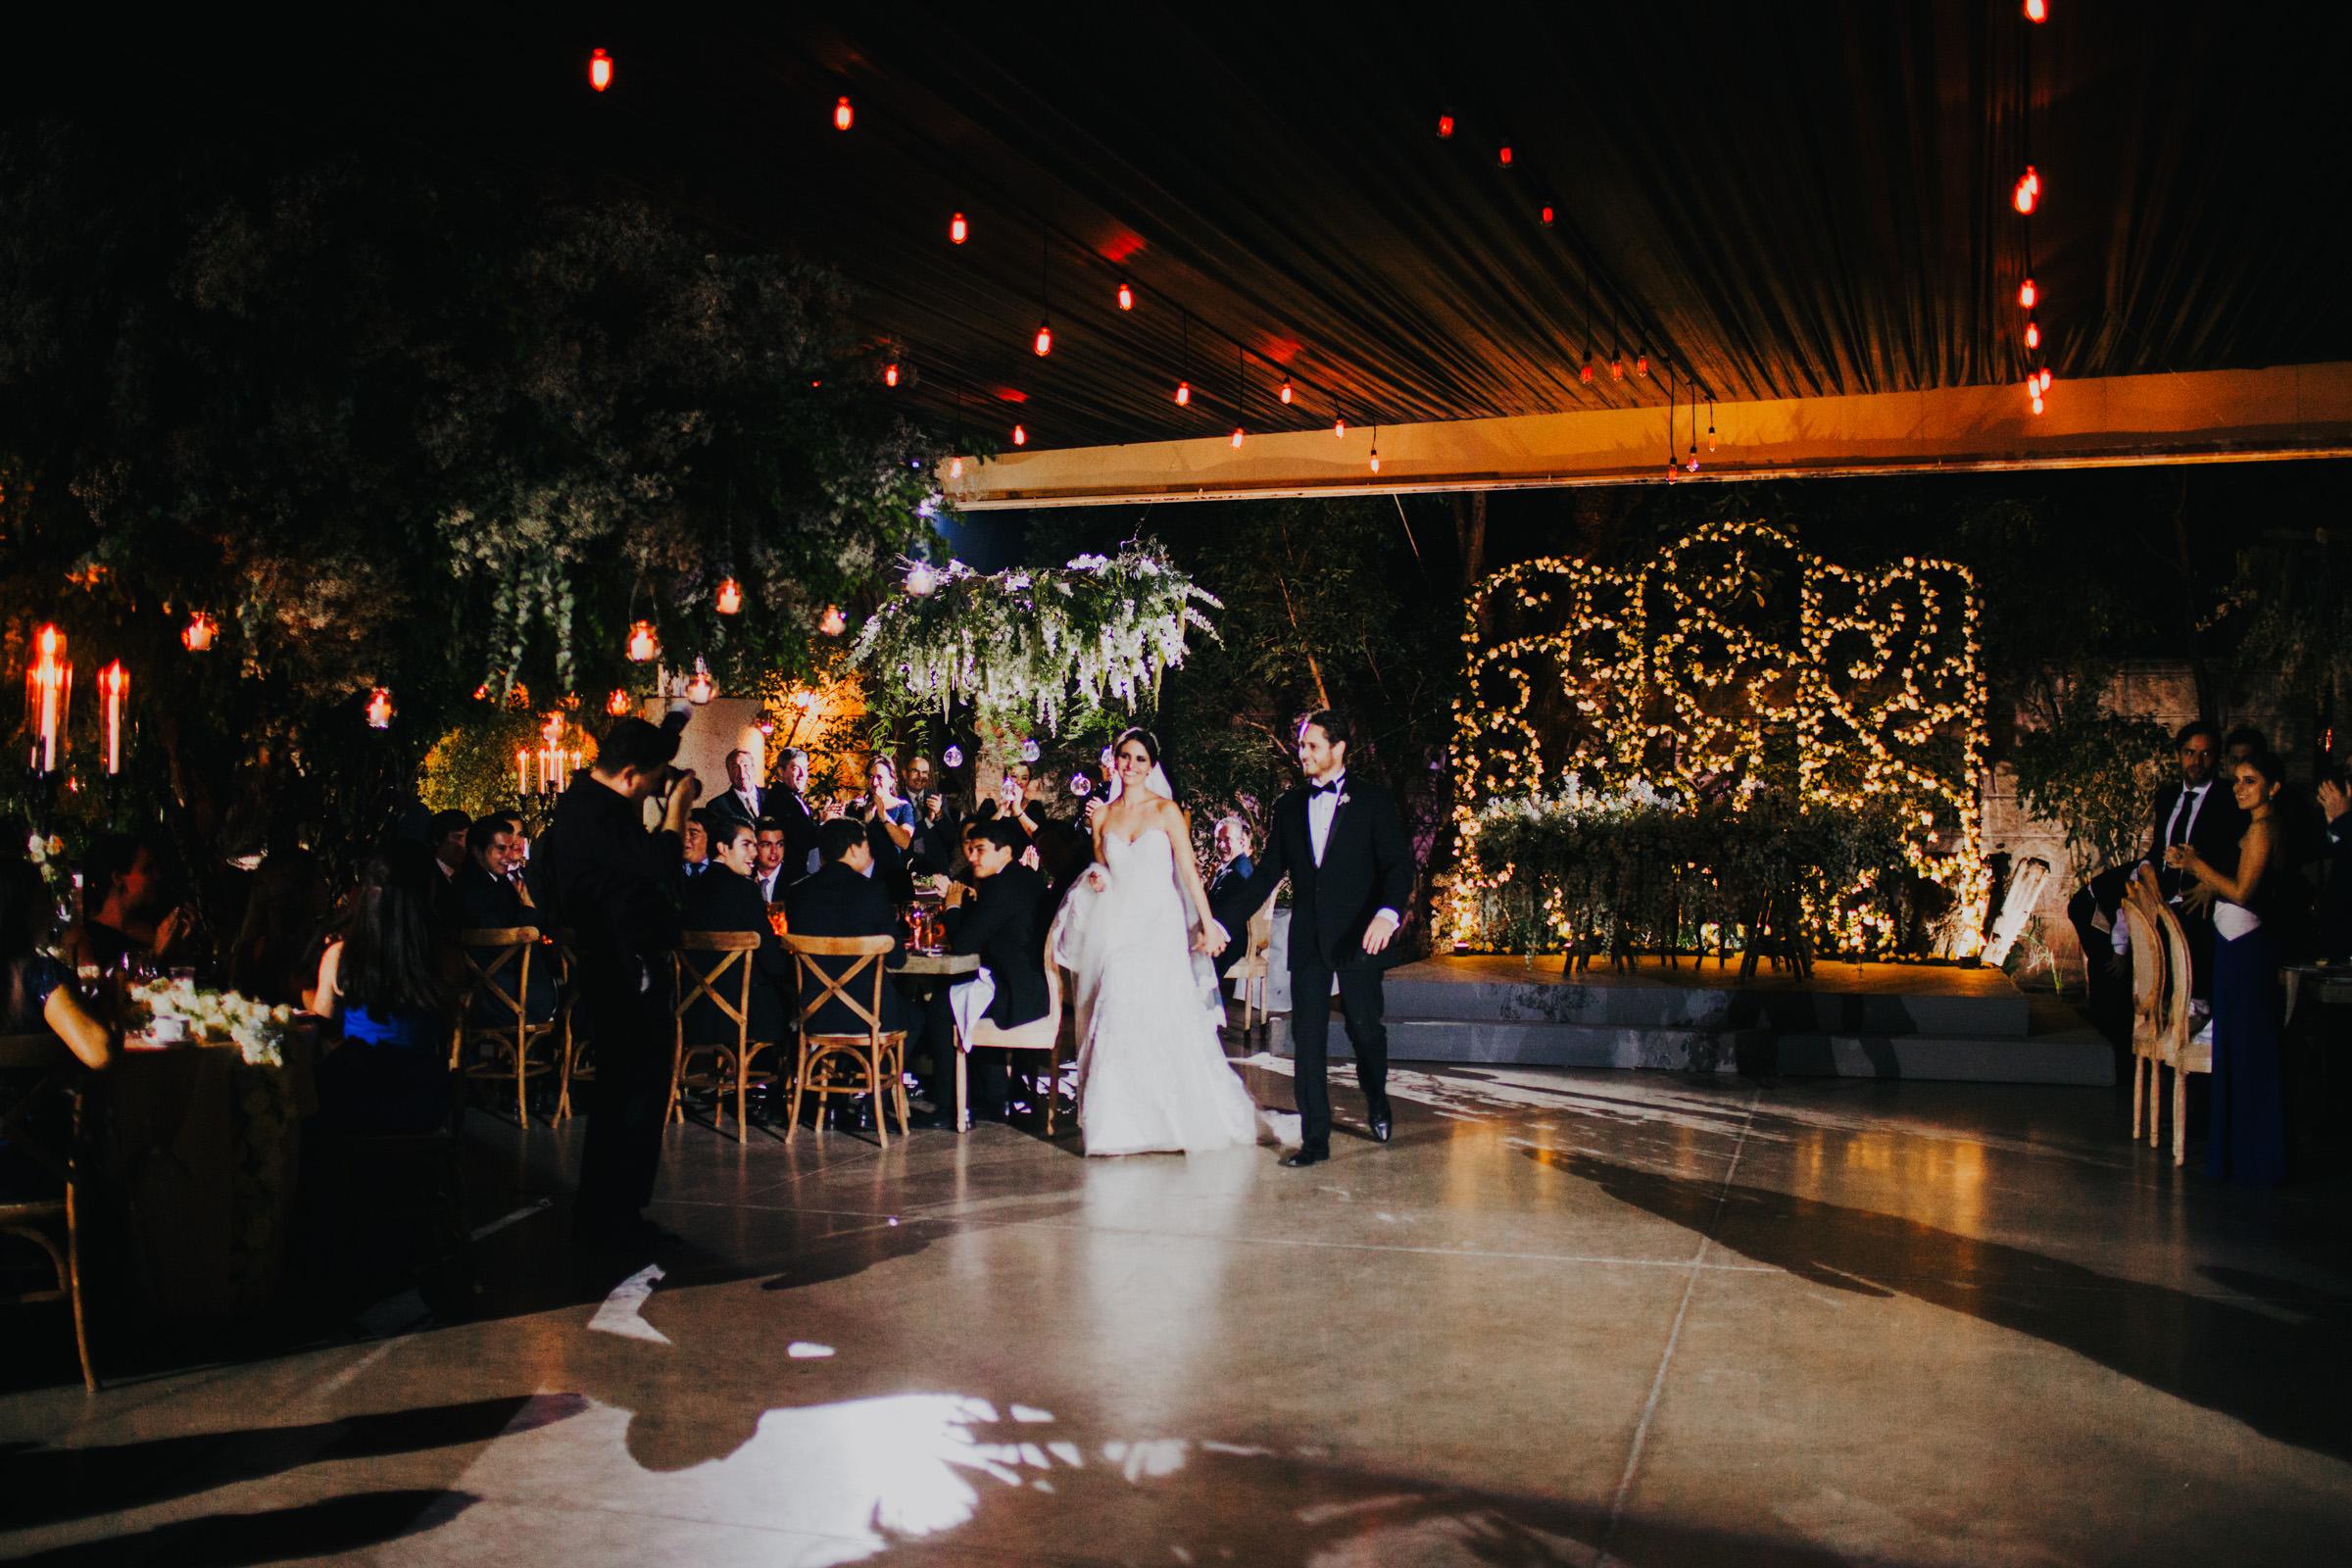 irapuato-boda-fotografia-jardines-alcalde-guanajuato-paulina-juan-pedro--126.jpg